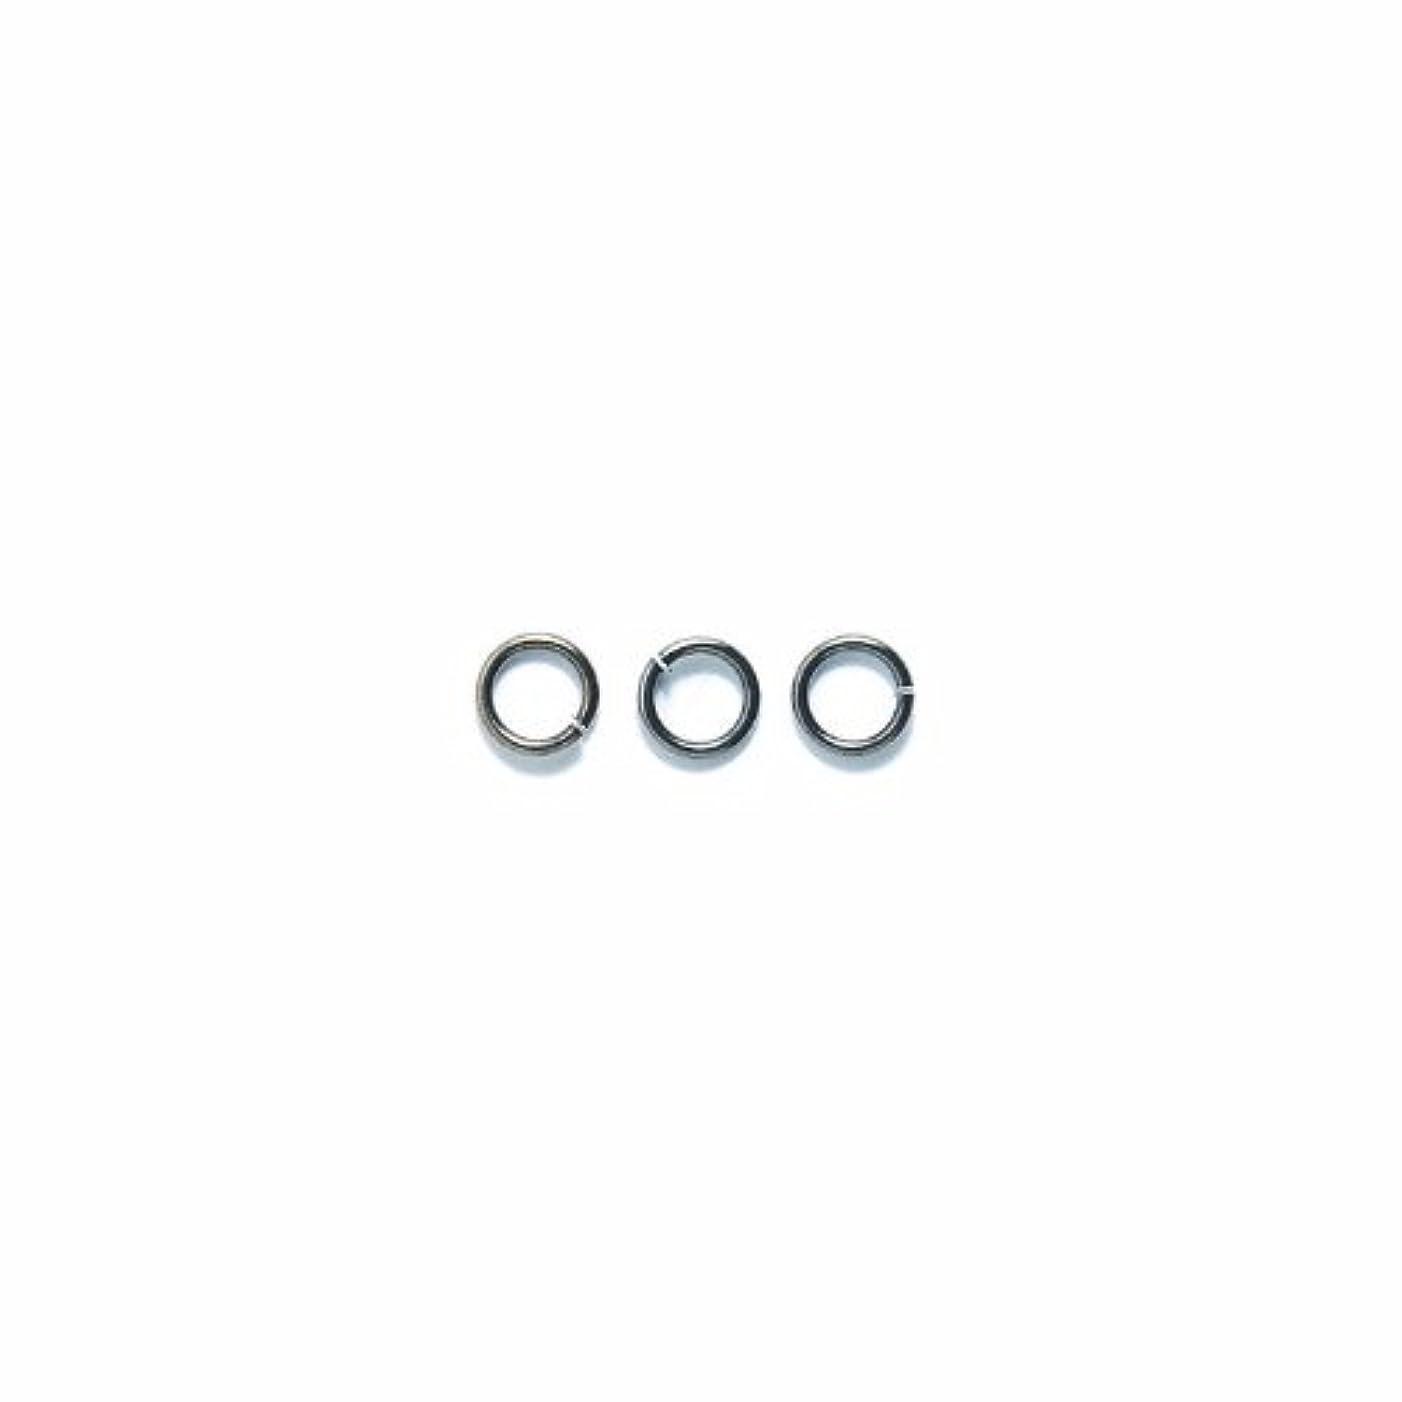 Shipwreck Beads Plated Brass Jump Ring, 6 mm, 18-Gauge, Metallic, Gunmetal, 50 gm Pack